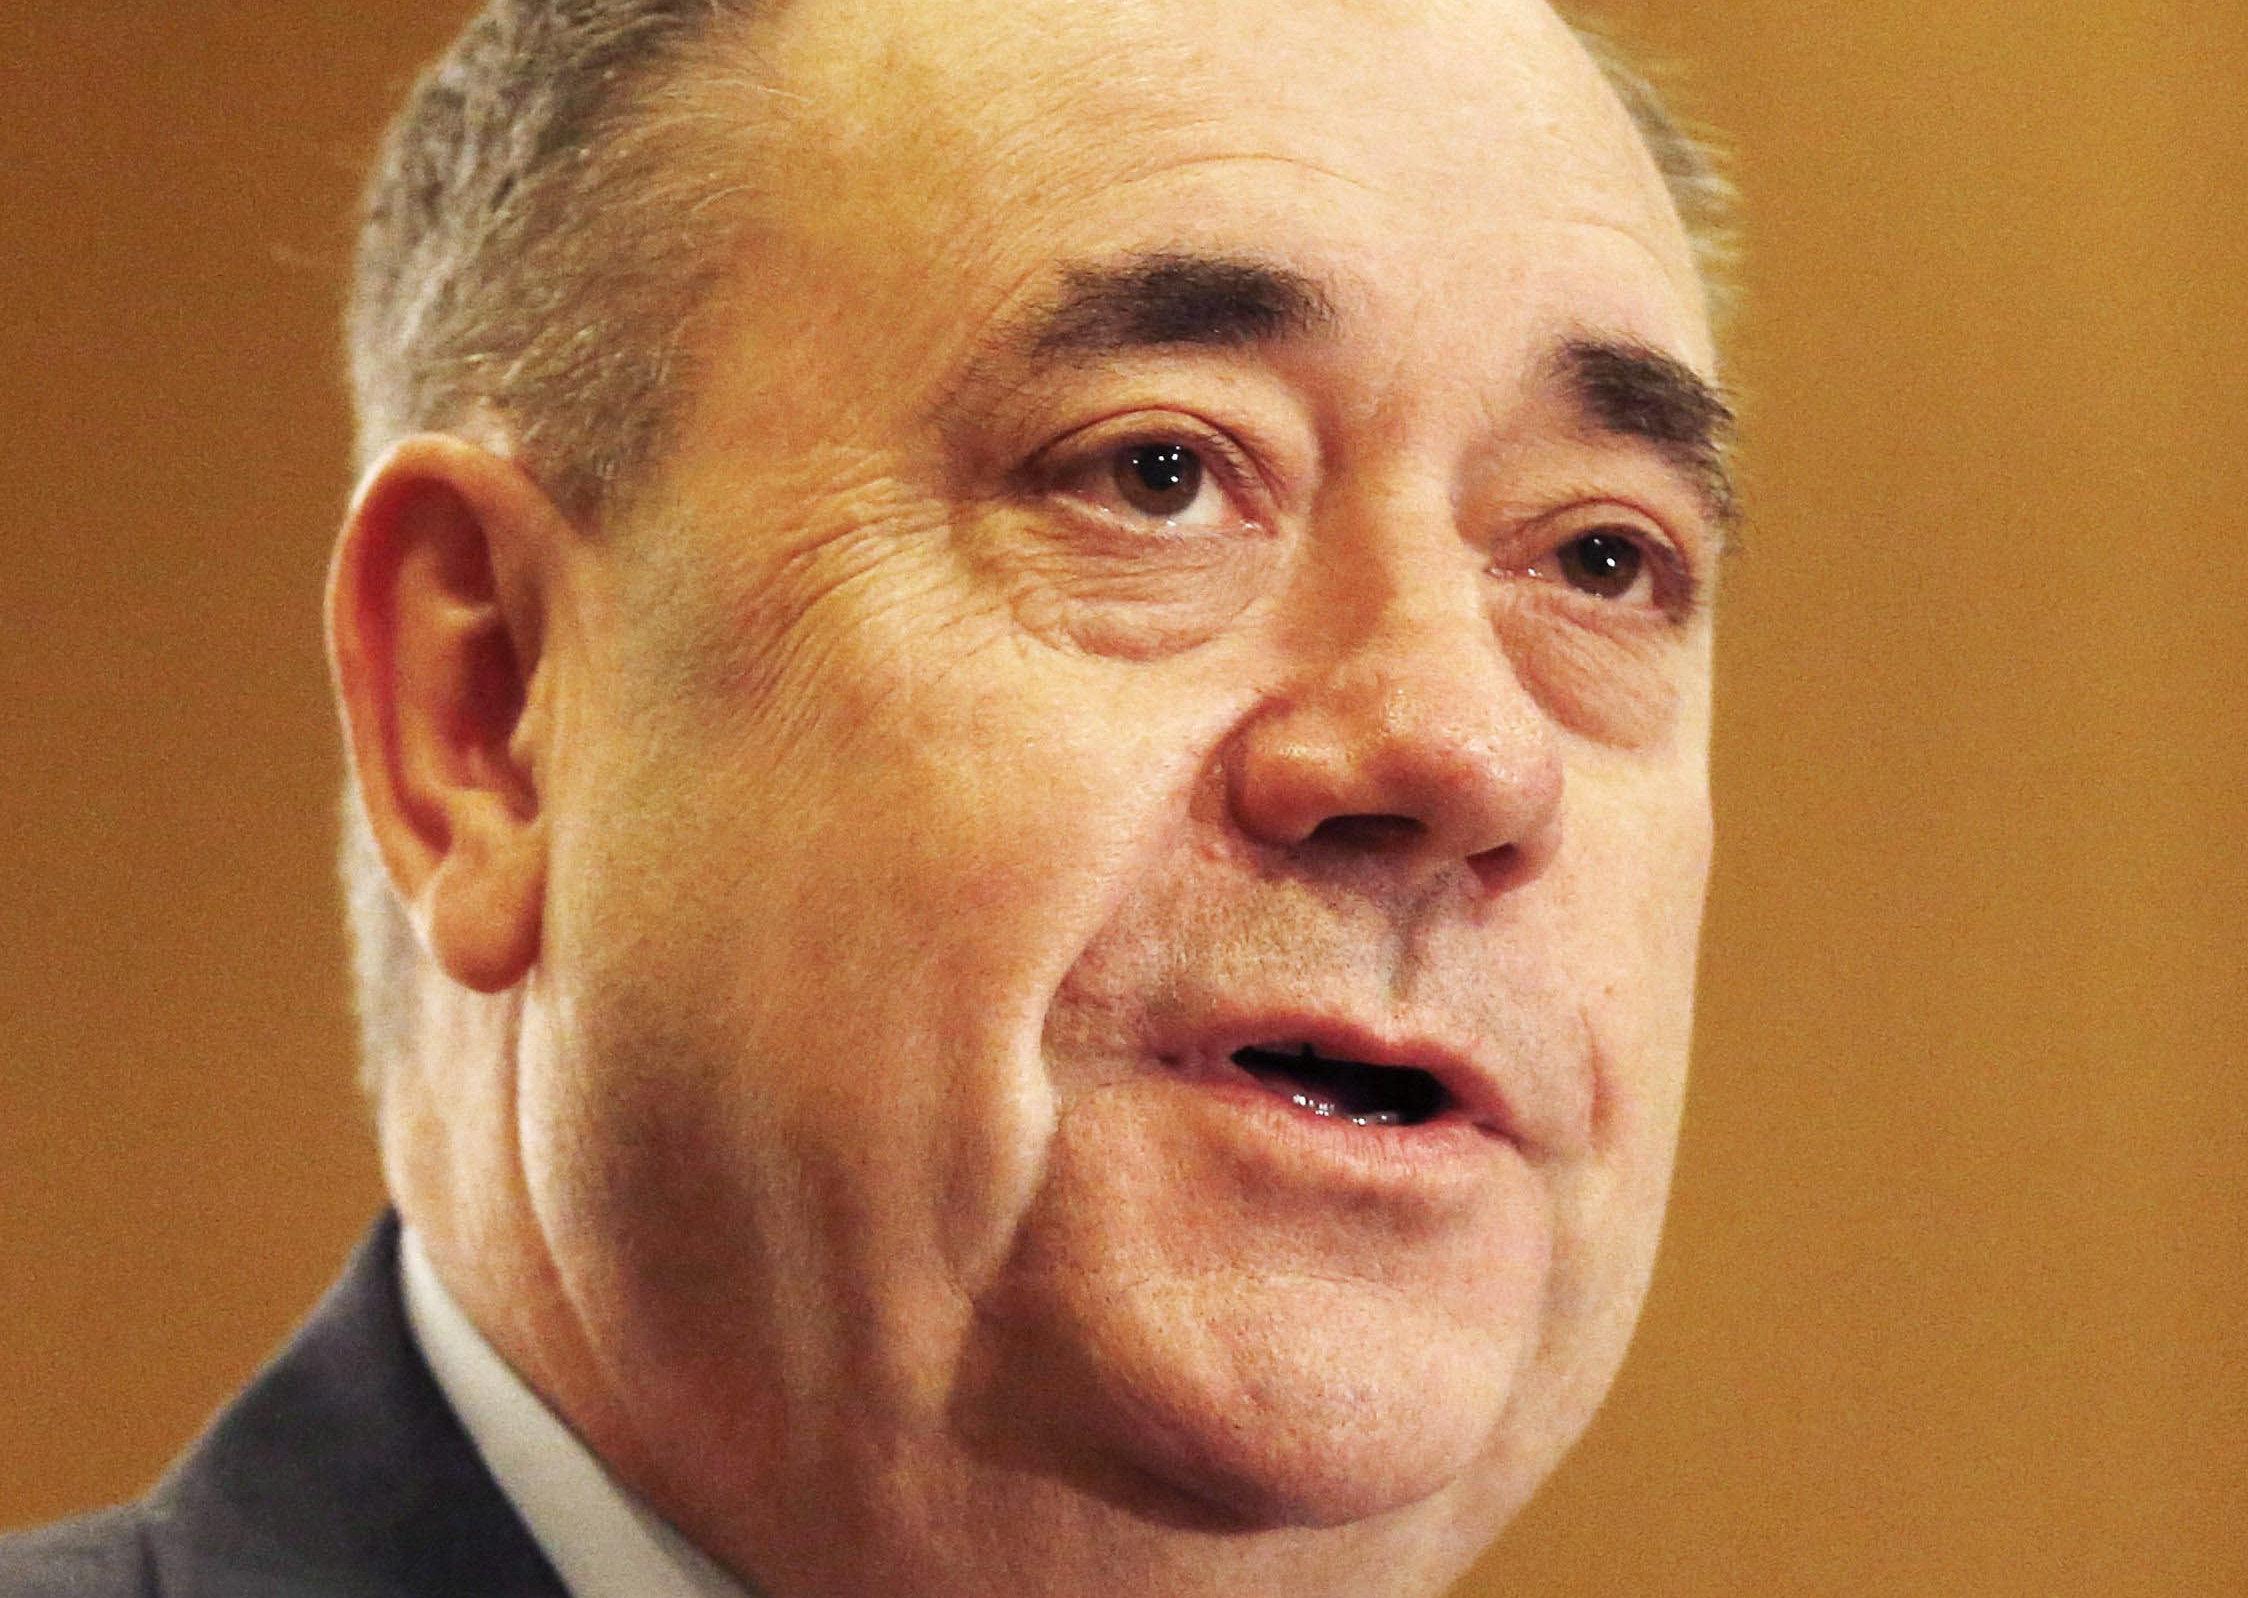 Alex Salmond inquiry seeking detailed evidence from Nicola Sturgeon